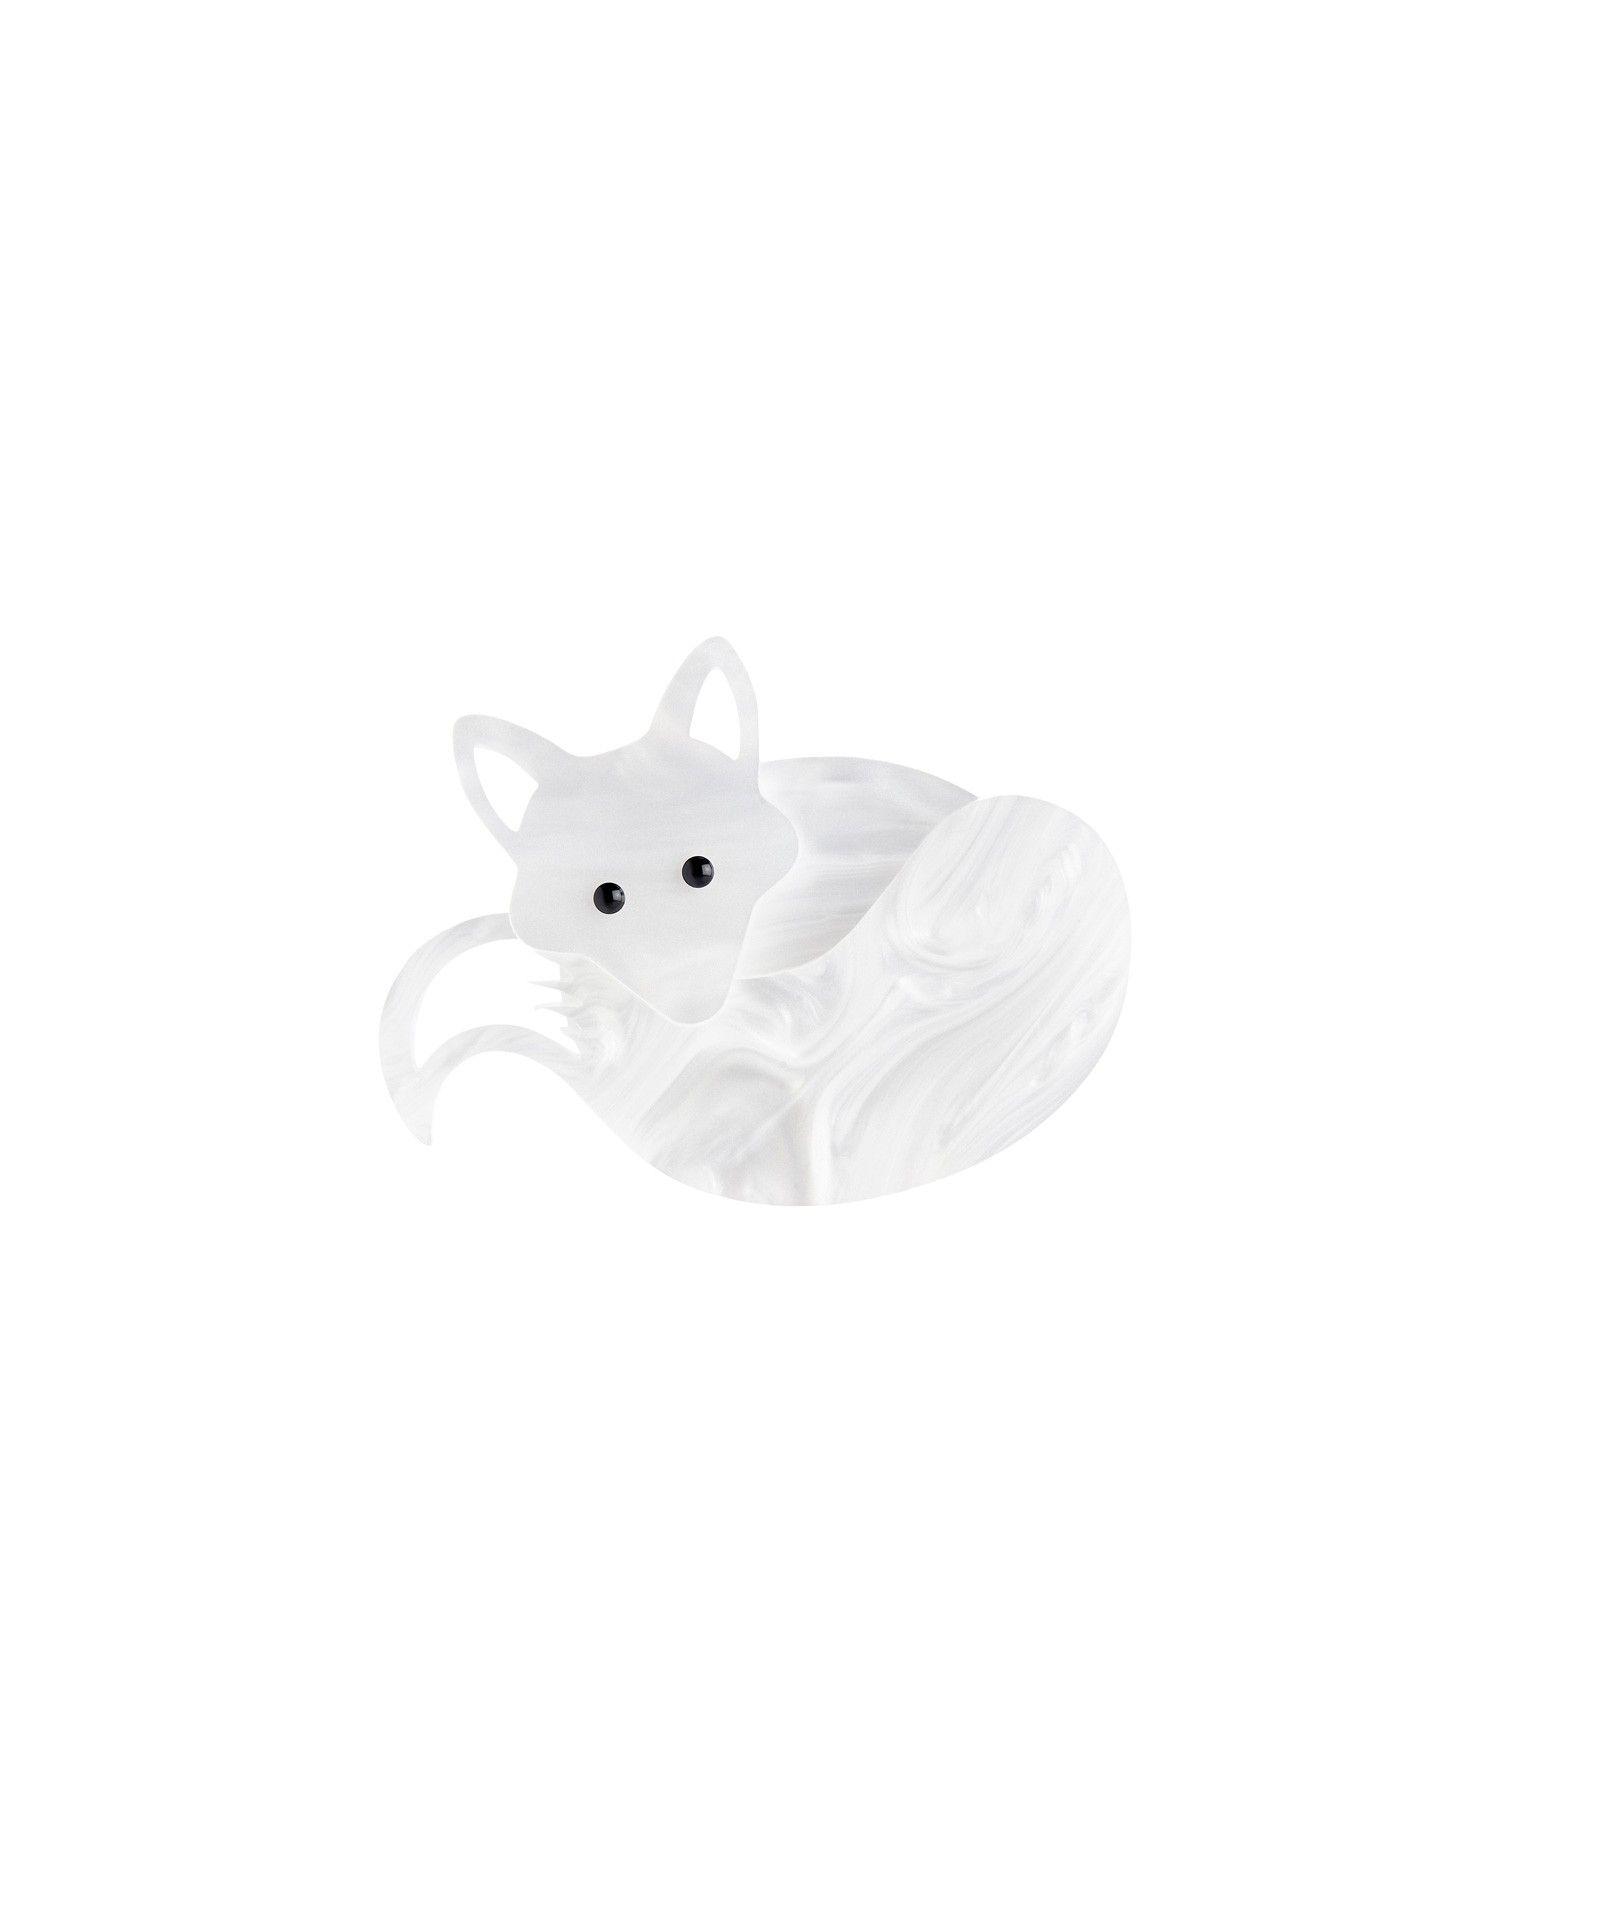 Fox Brooch - White Pearl